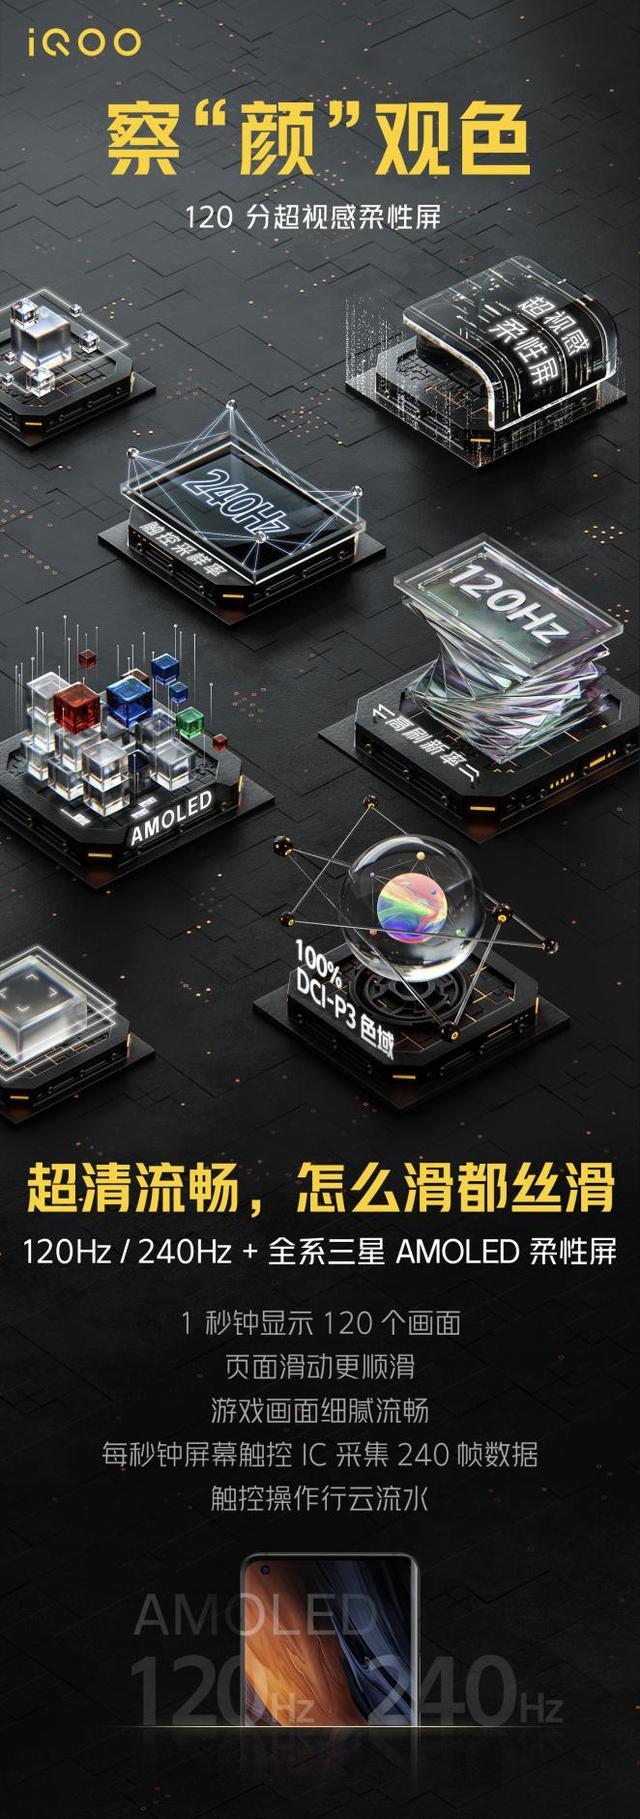 iQOO 5 系列再爆硬核配置 120Hz超视感柔性屏重磅加持